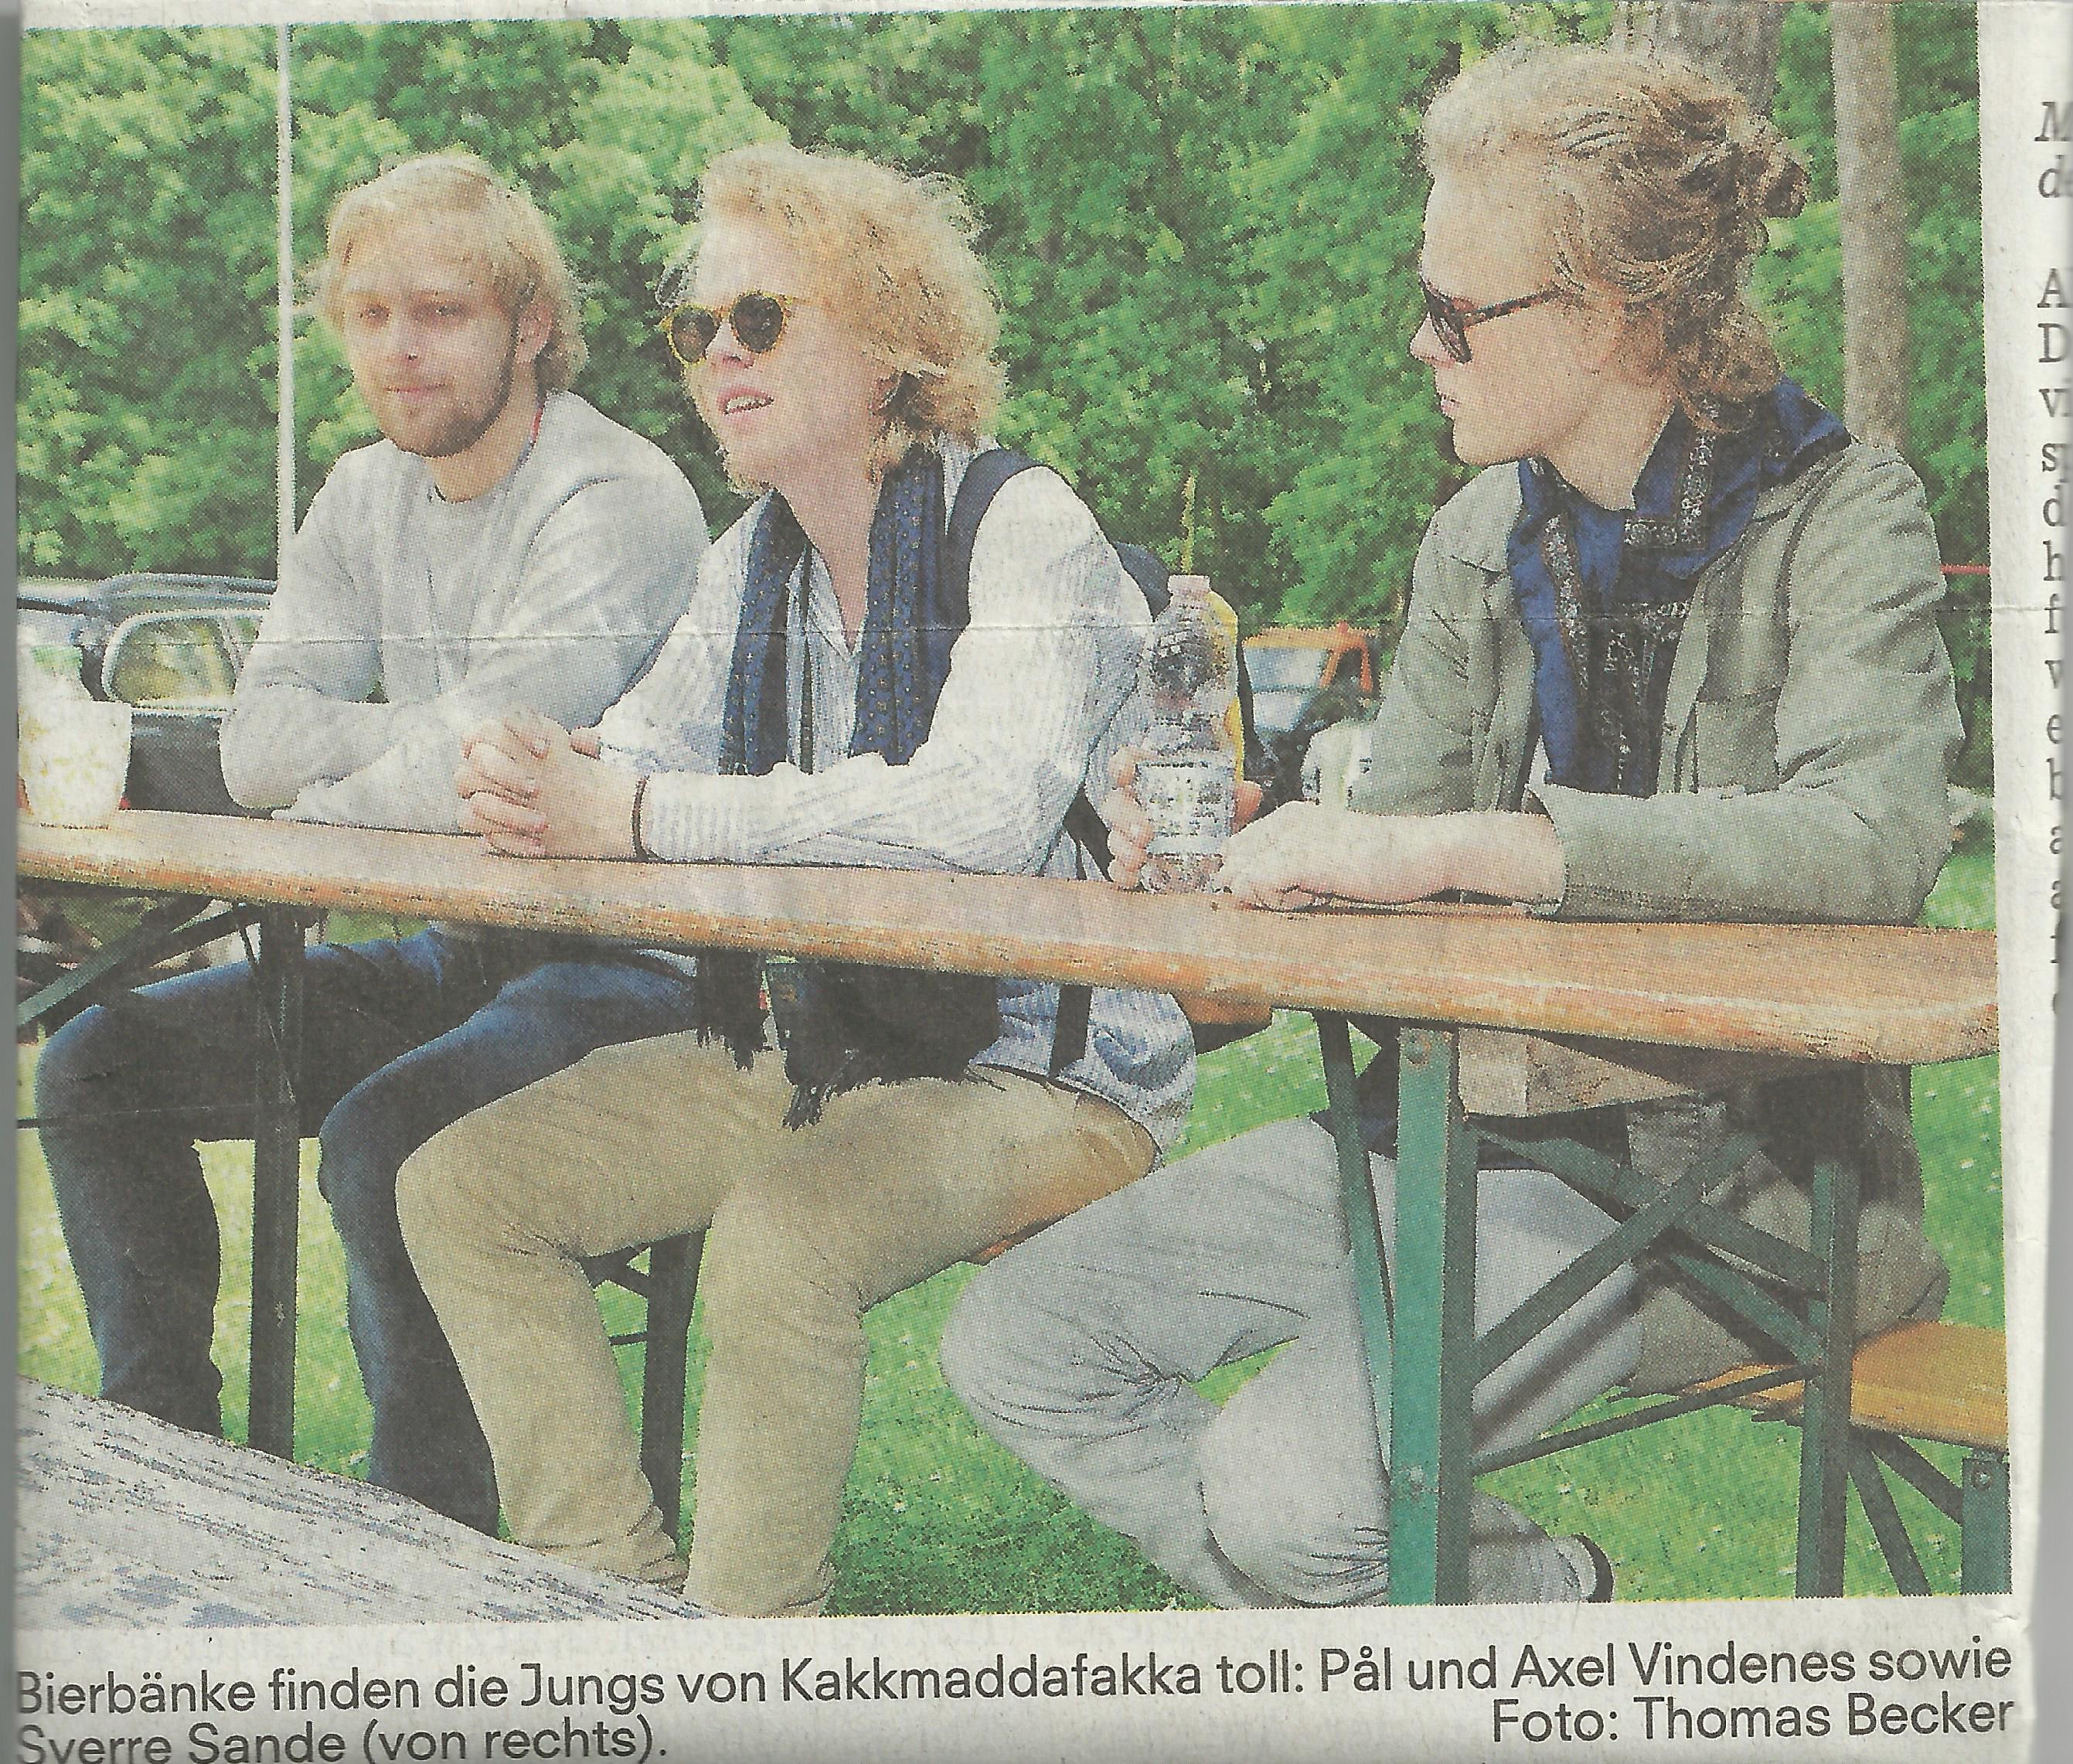 Kakkmaddafakka Loves German Biergarten